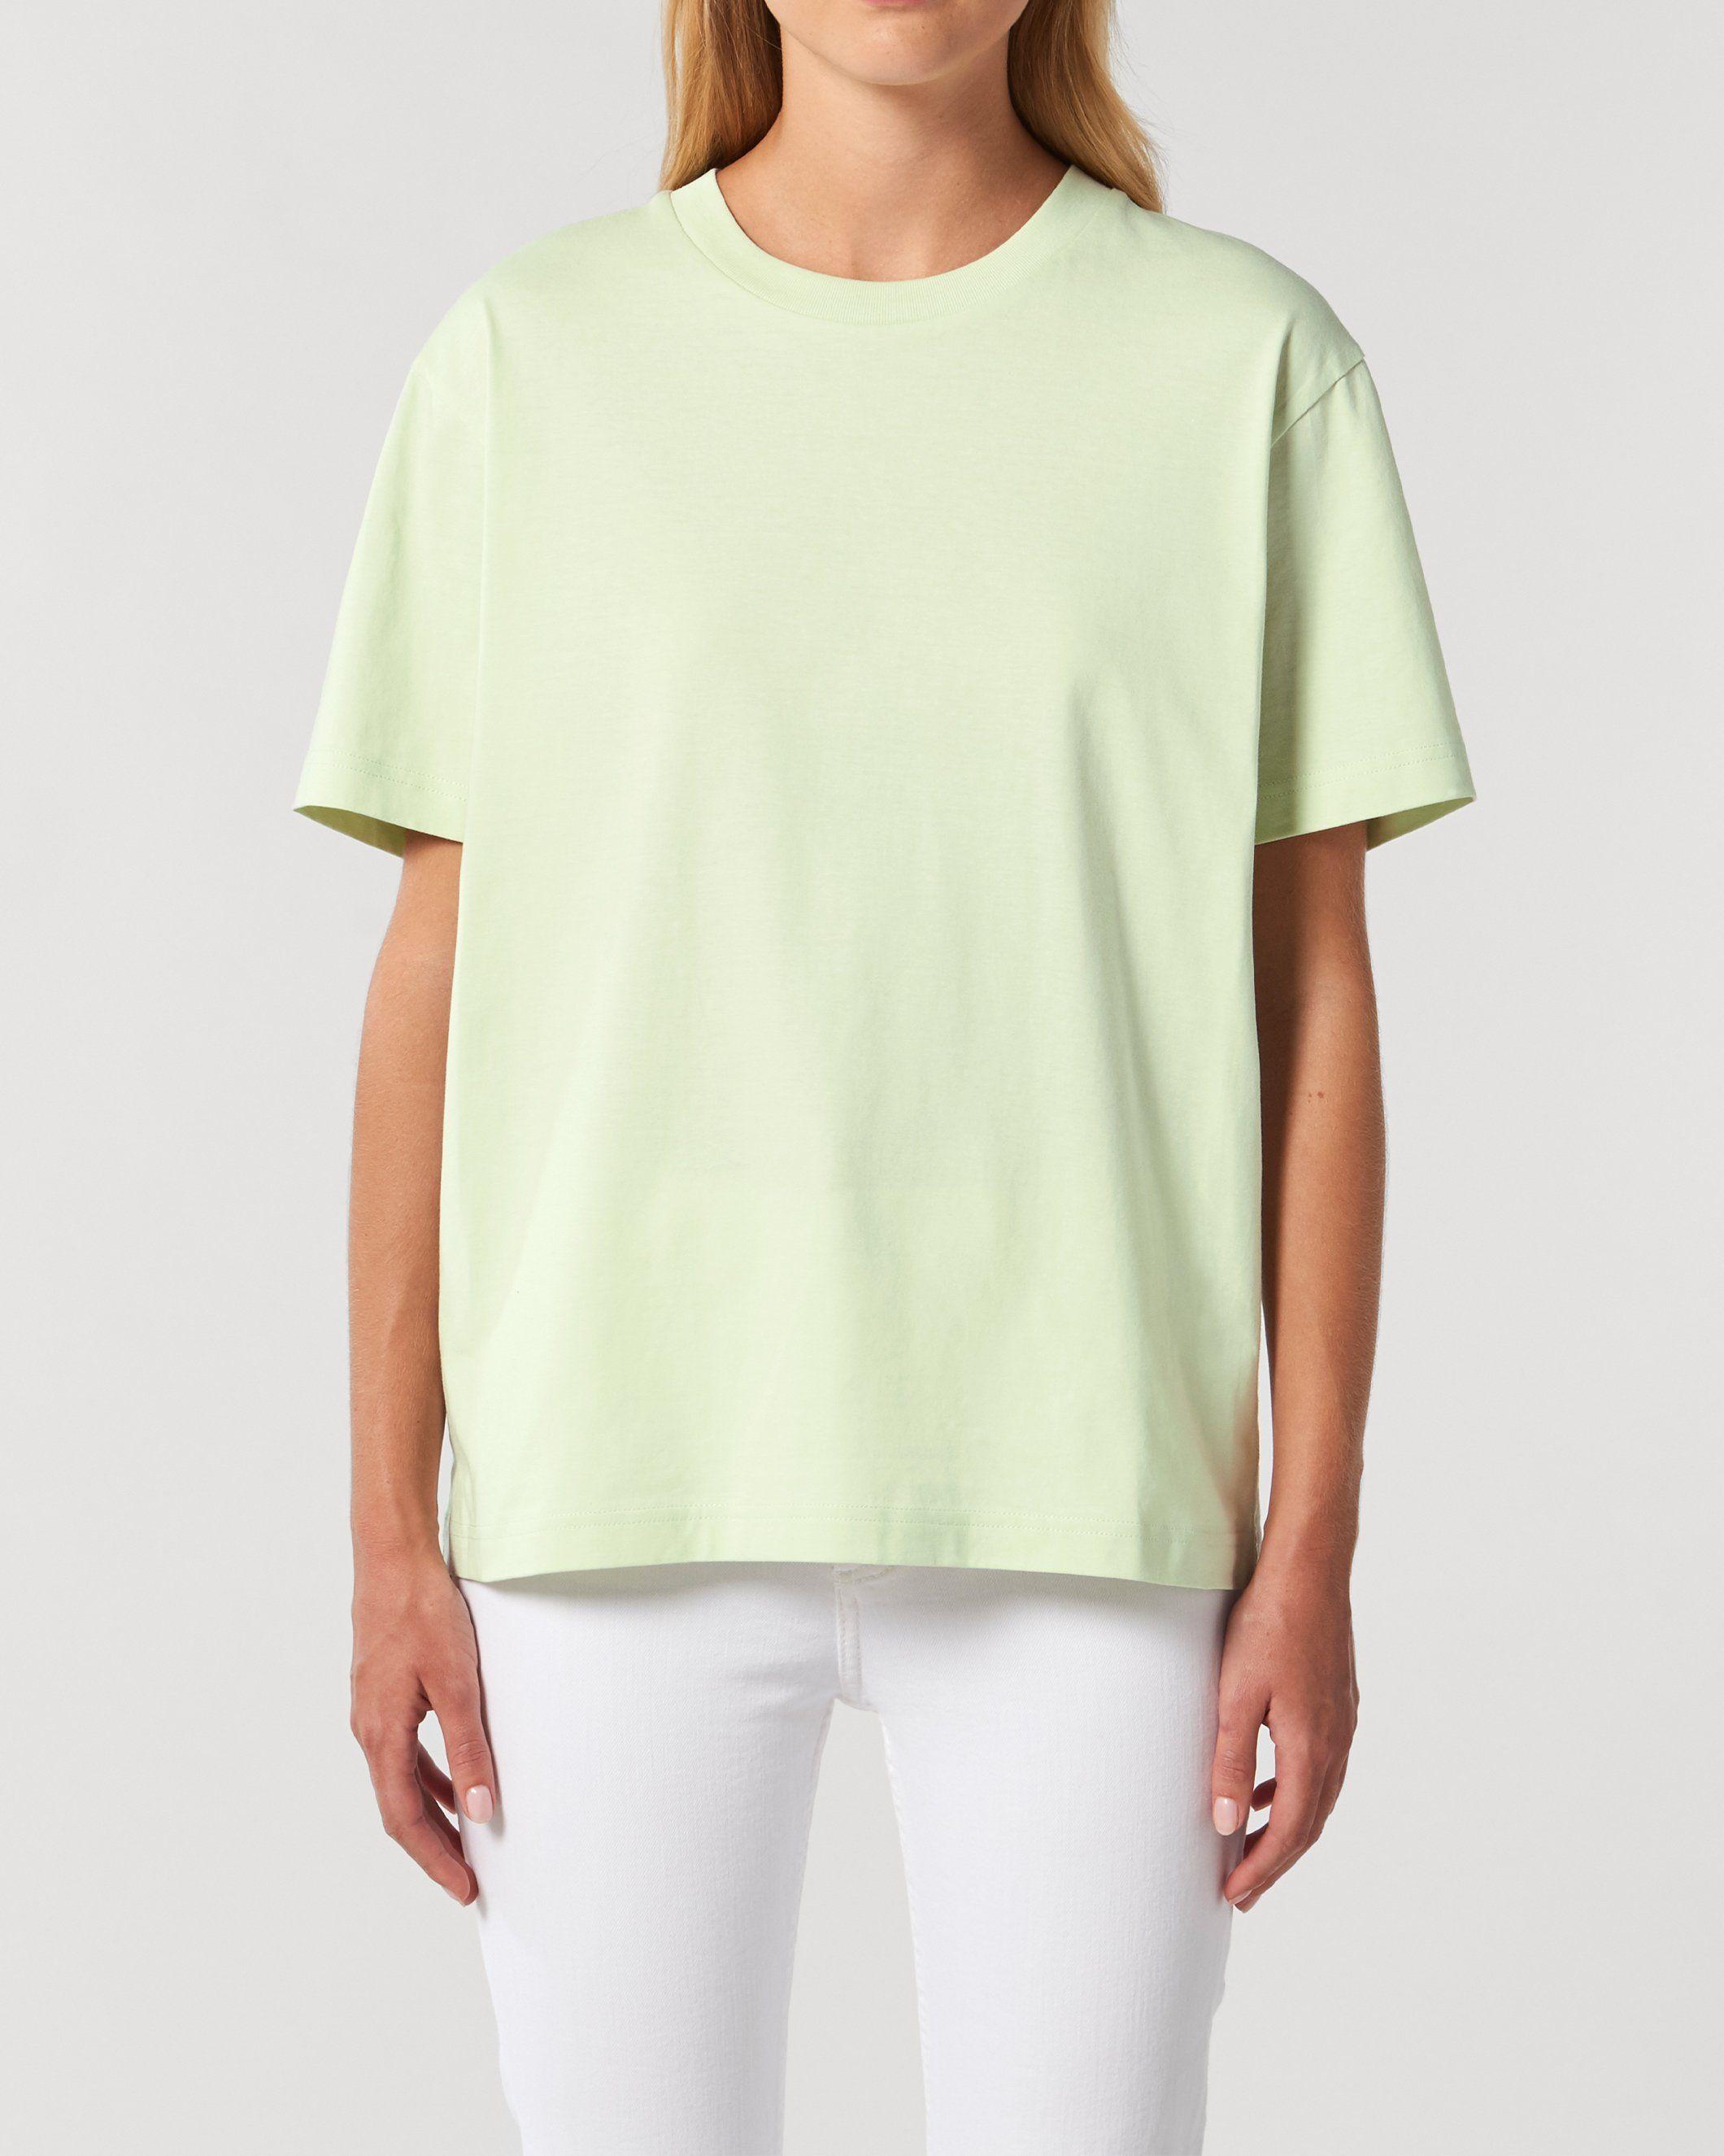 Antaratma Unisex Relaxed T-Shirt in Green